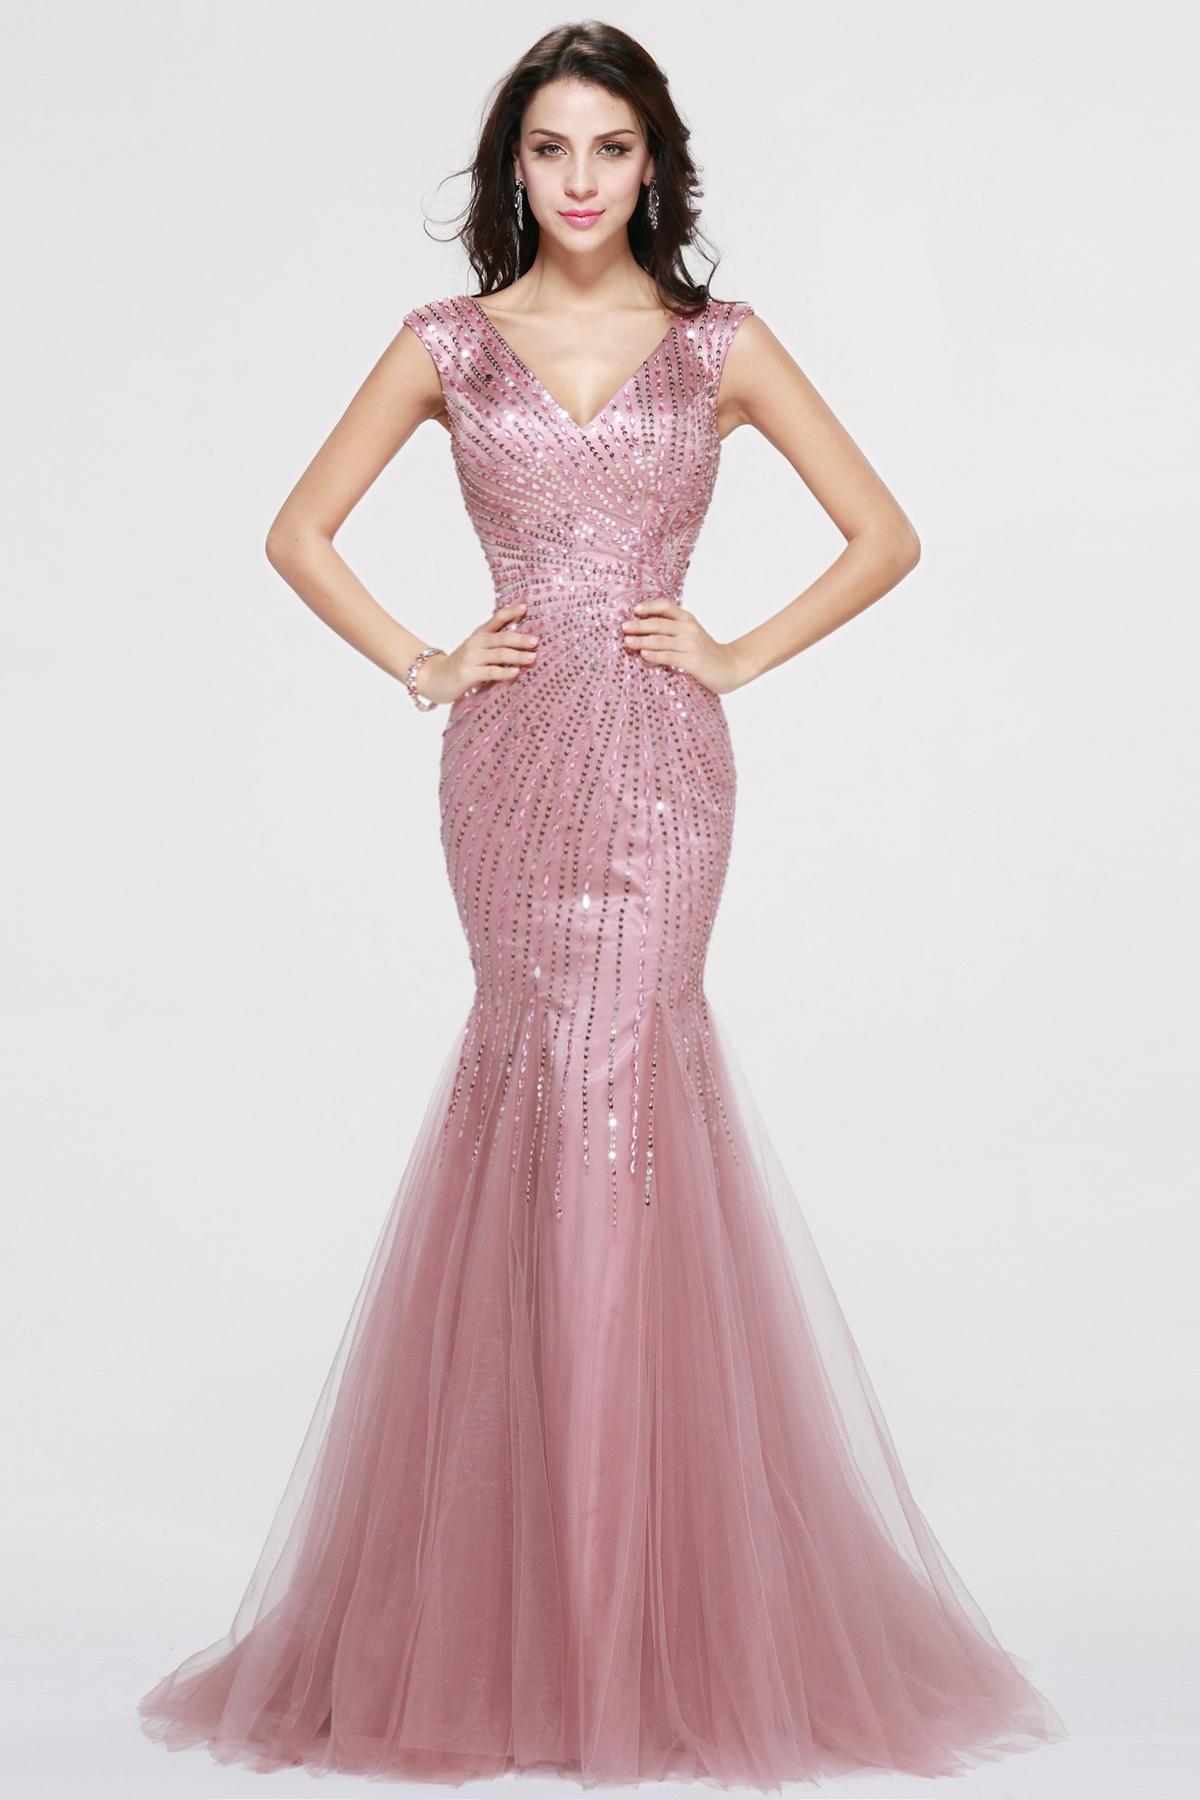 54ad5fa53d7f Corte Sirena Escote en V Barrer / cepillo tren Con lentejuelas Vestido de  fiesta